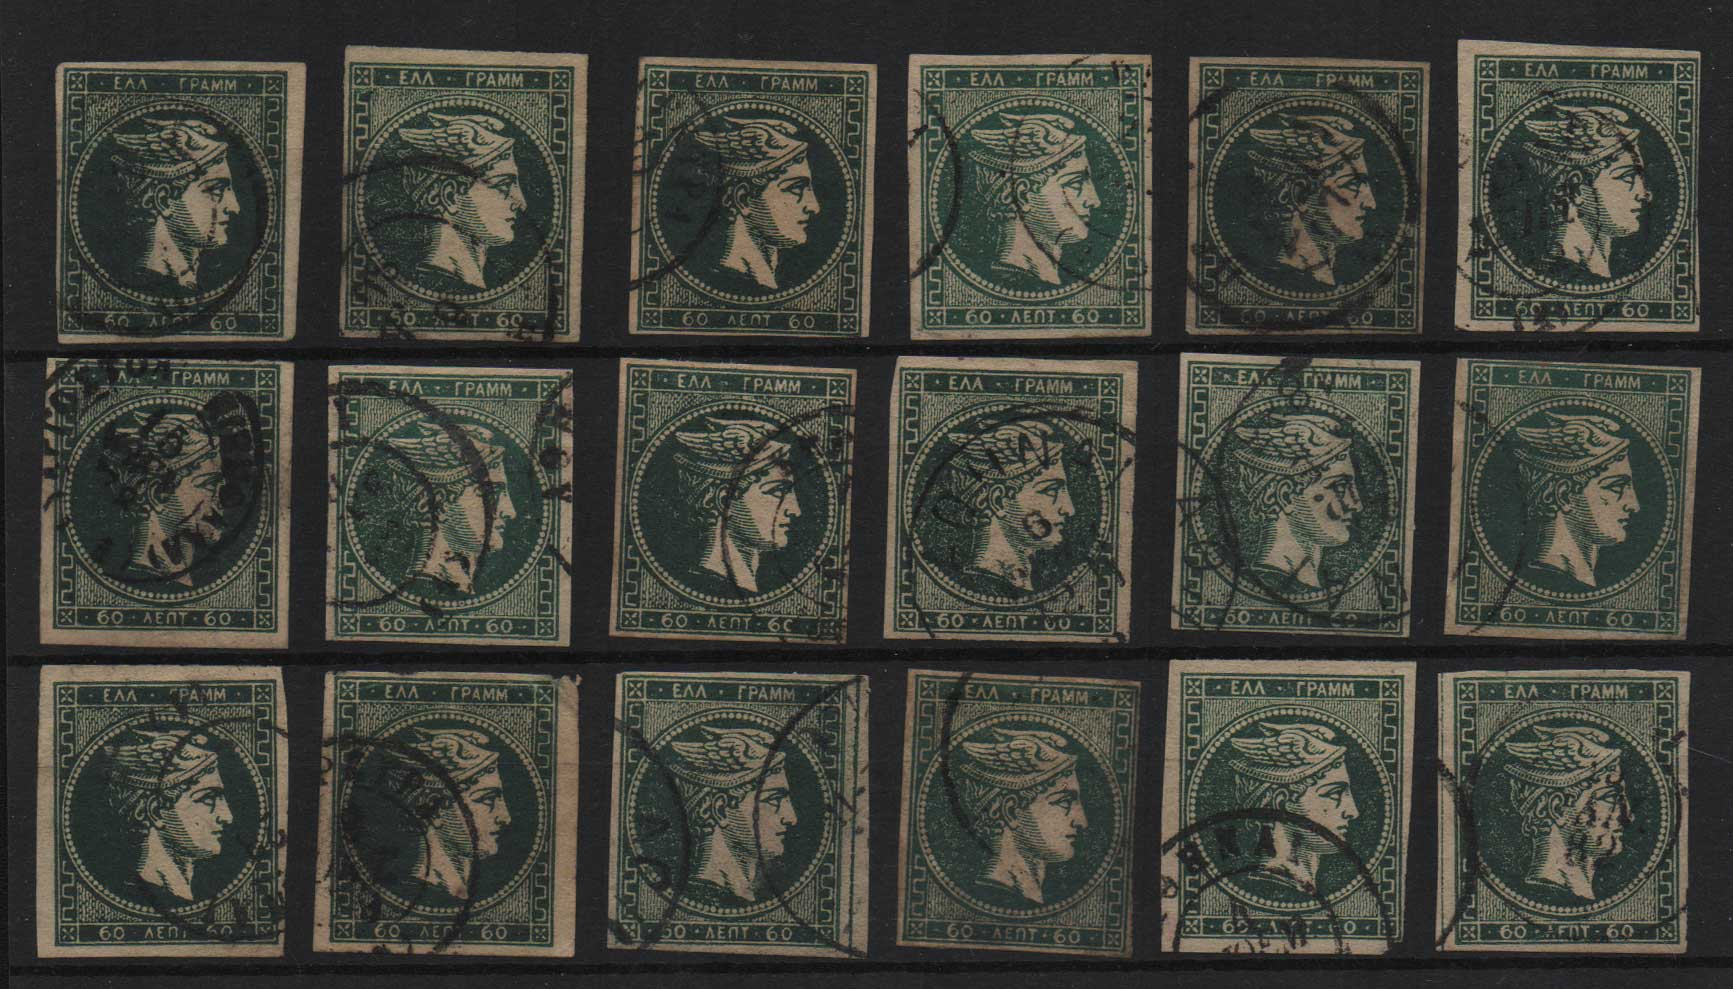 Lot 18 - -  LARGE HERMES HEAD large hermes head -  Athens Auctions Public Auction 69 General Stamp Sale